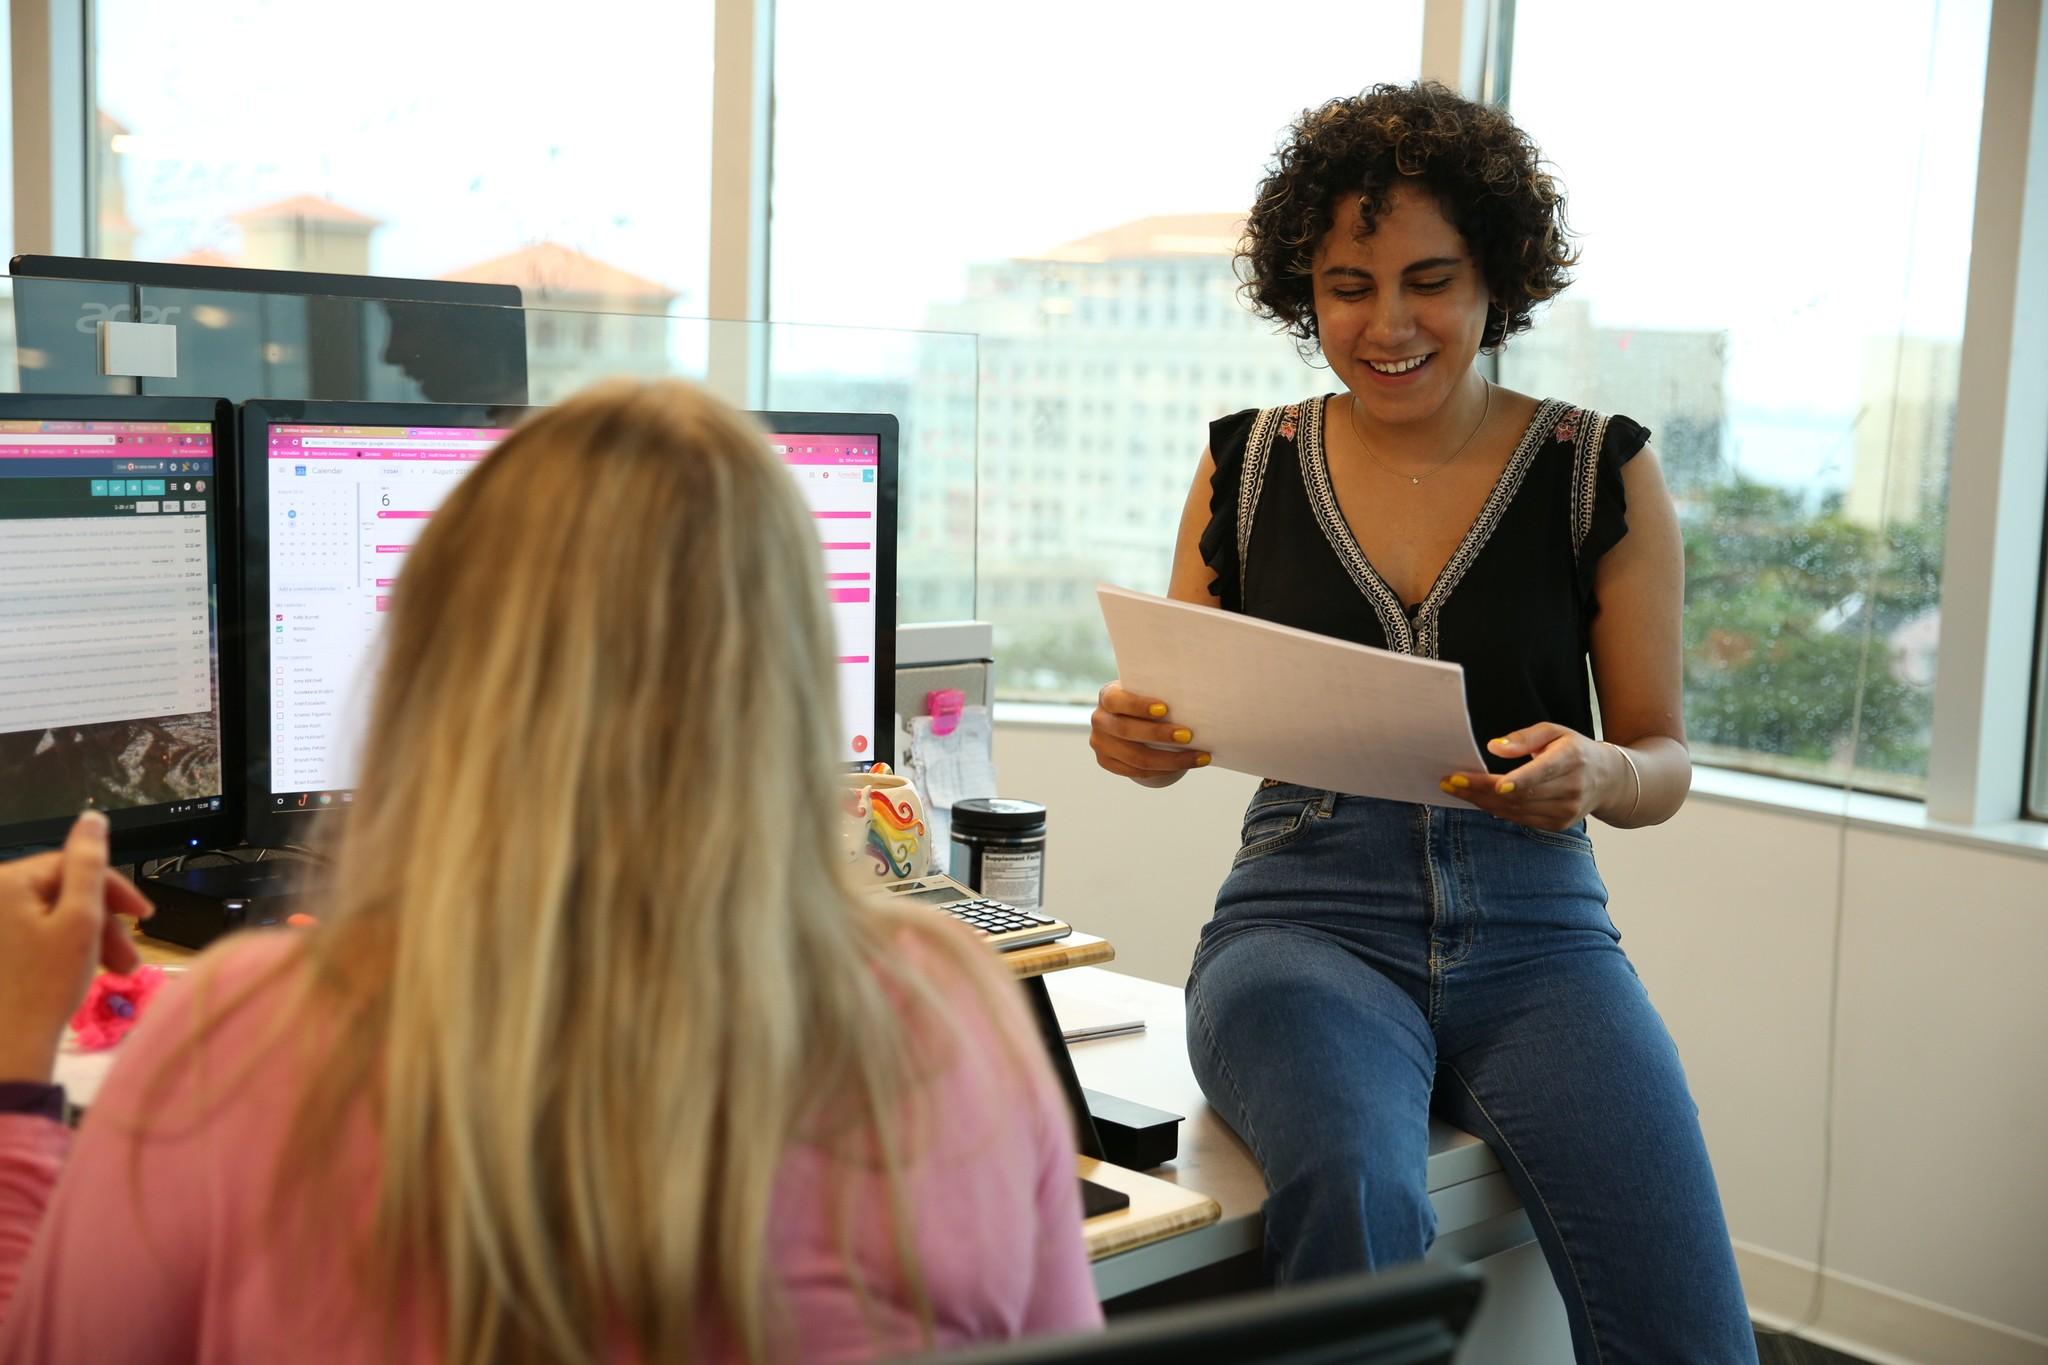 Women In Tech: KnowBe4's Scholarship For Women In Cybersecurity